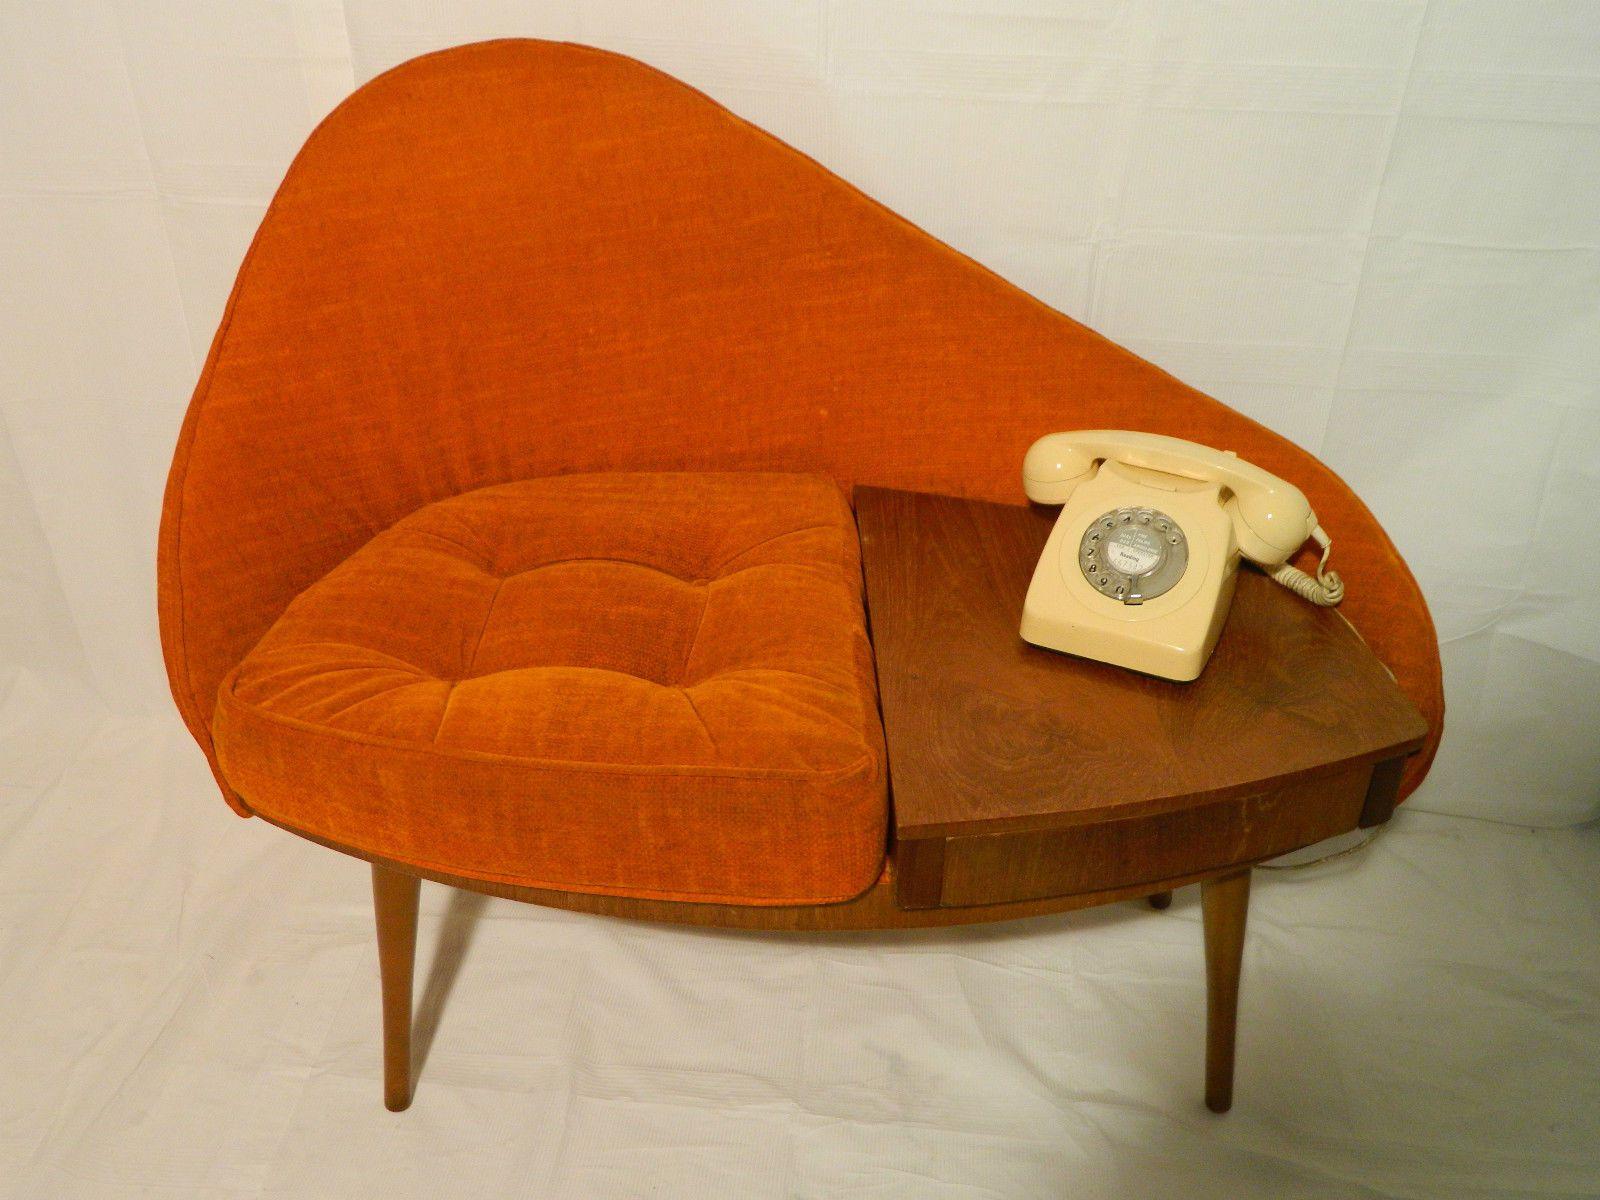 vintage mid century egg `s chippy heath telephone seat atomic  - vintage mid century egg `s chippy heath telephone seat atomic retrorare  ebay